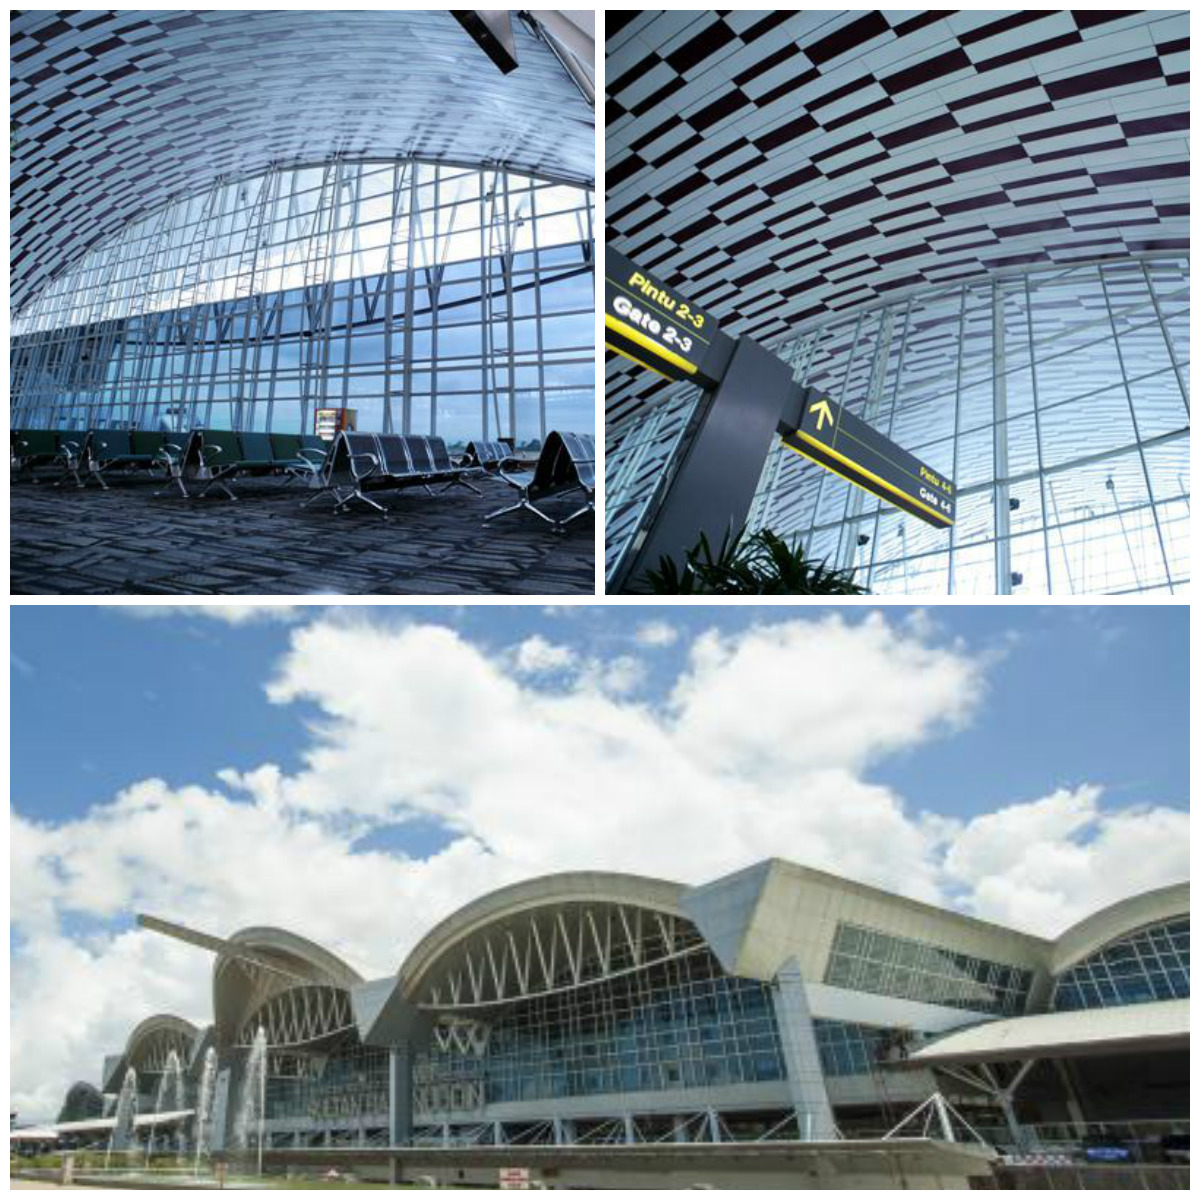 http://hasanuddin-airport.co.id/